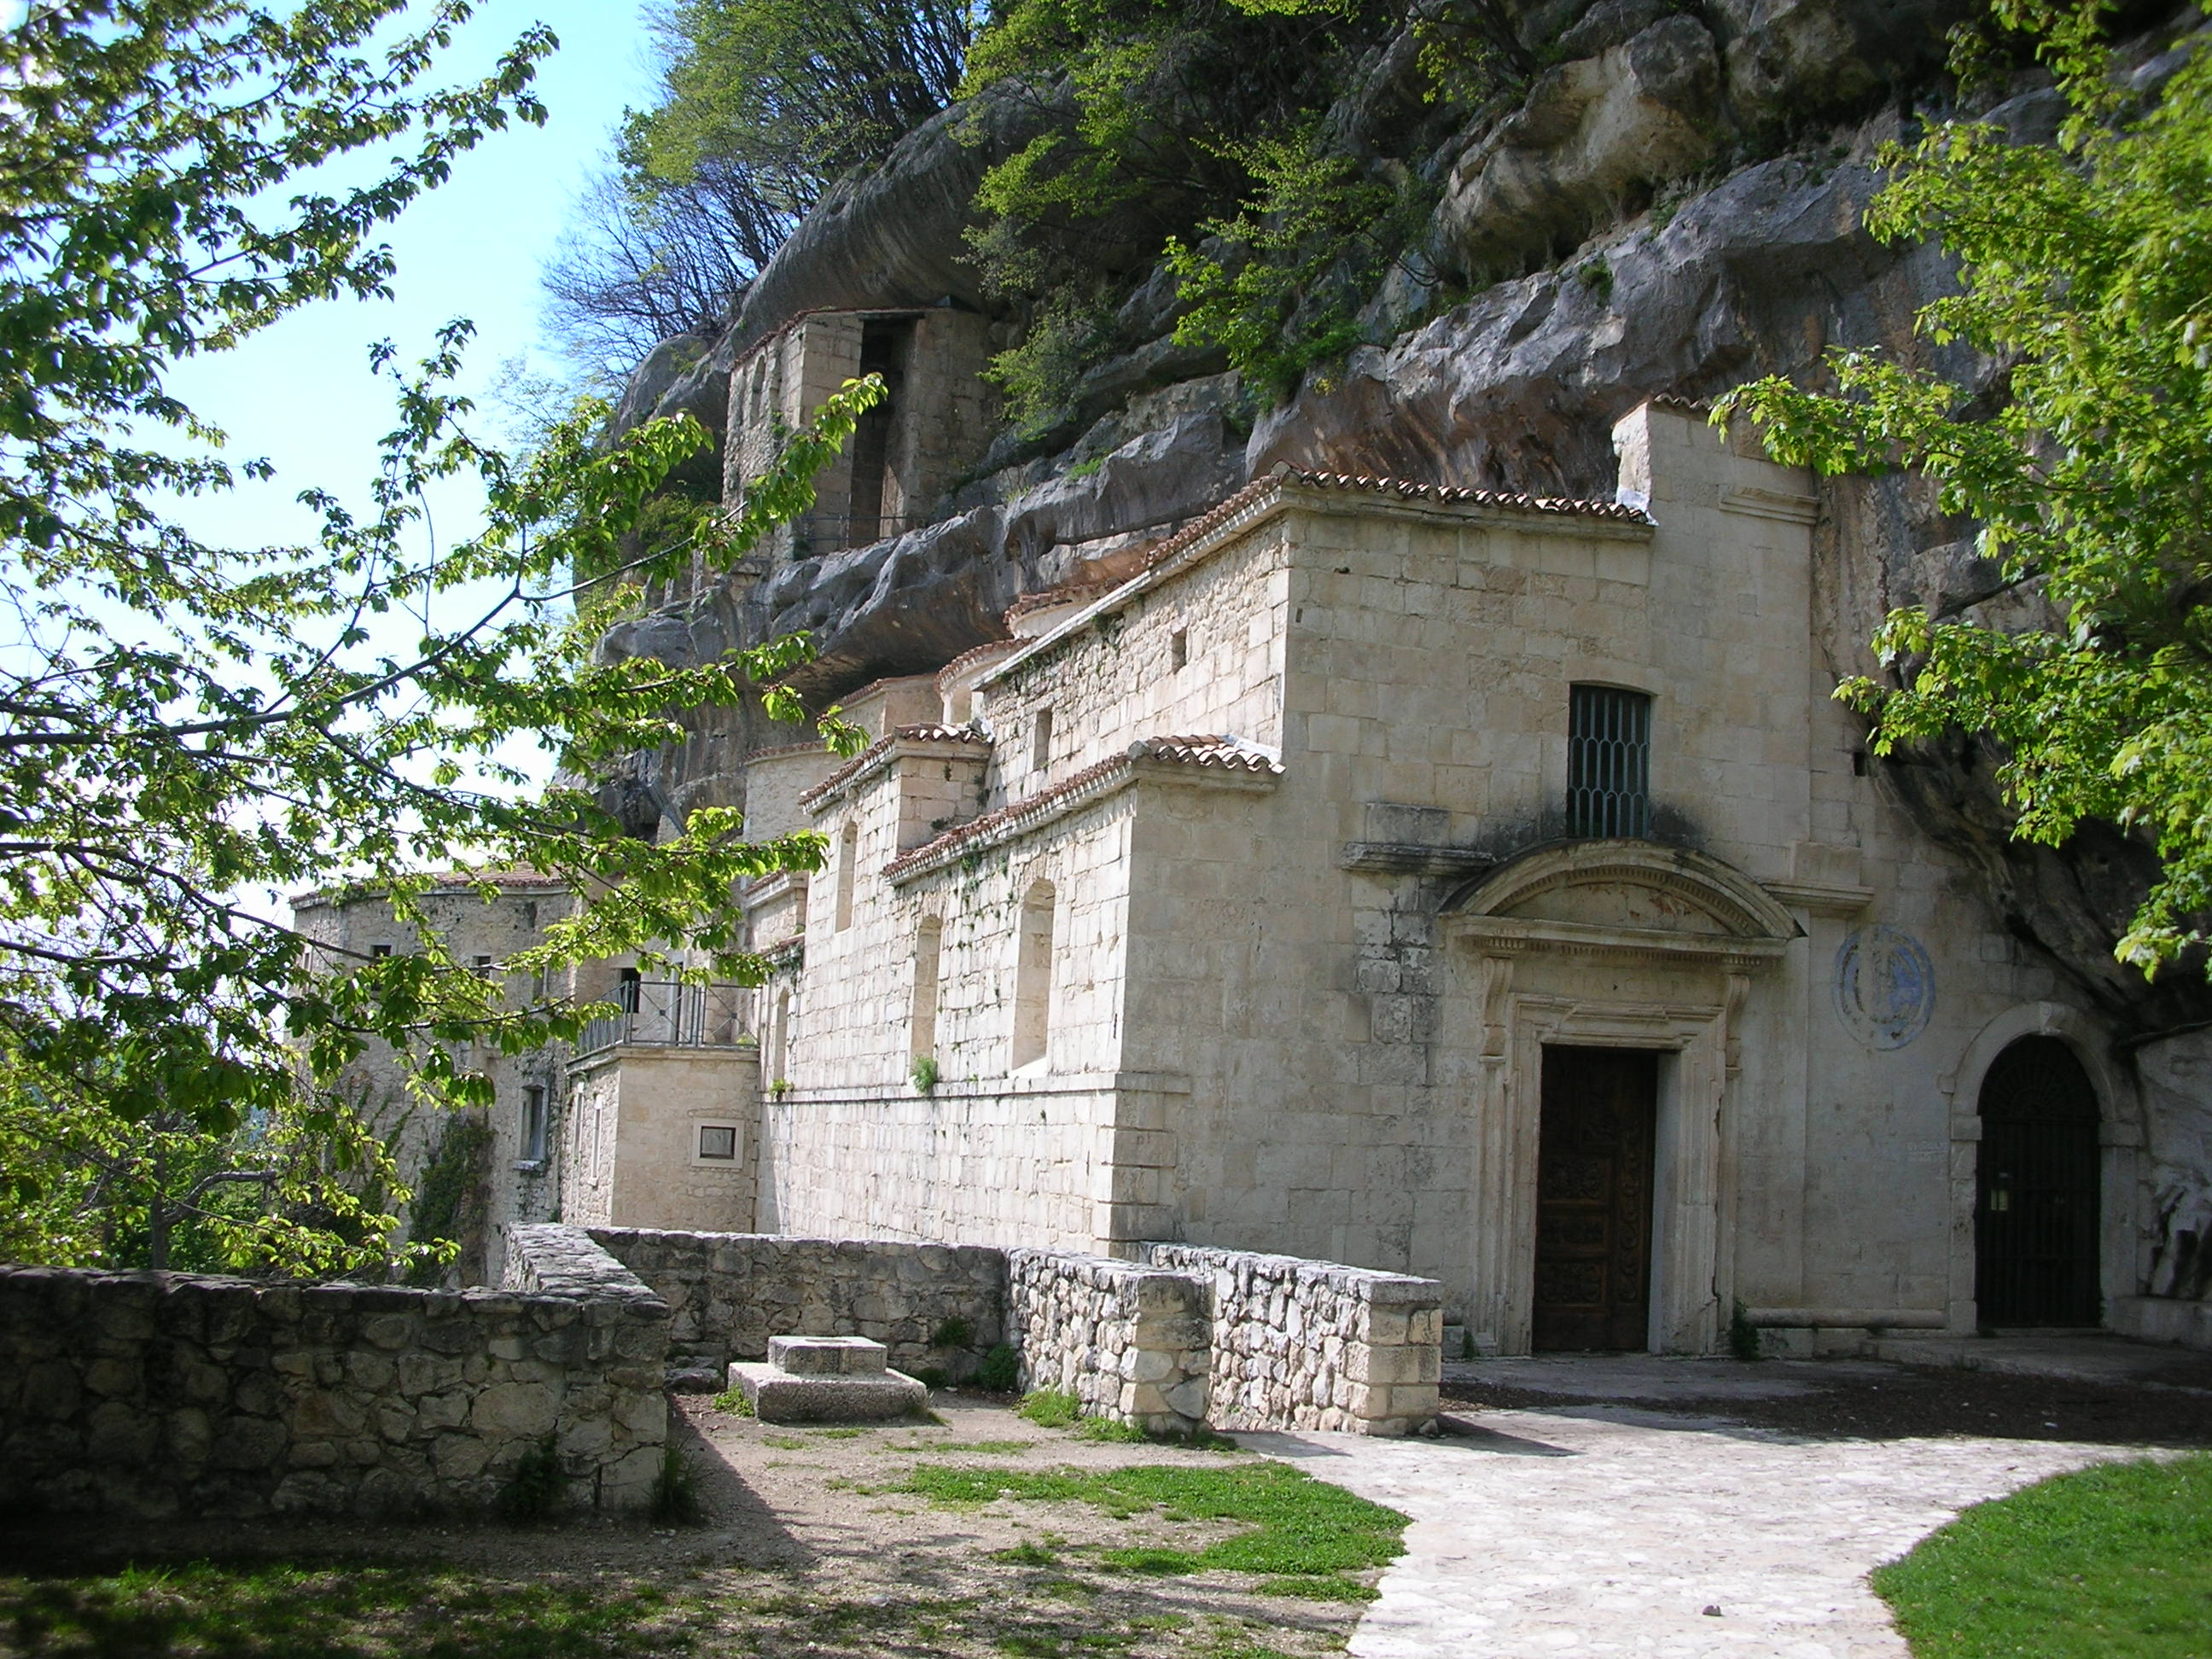 Hermitage S.Spirito